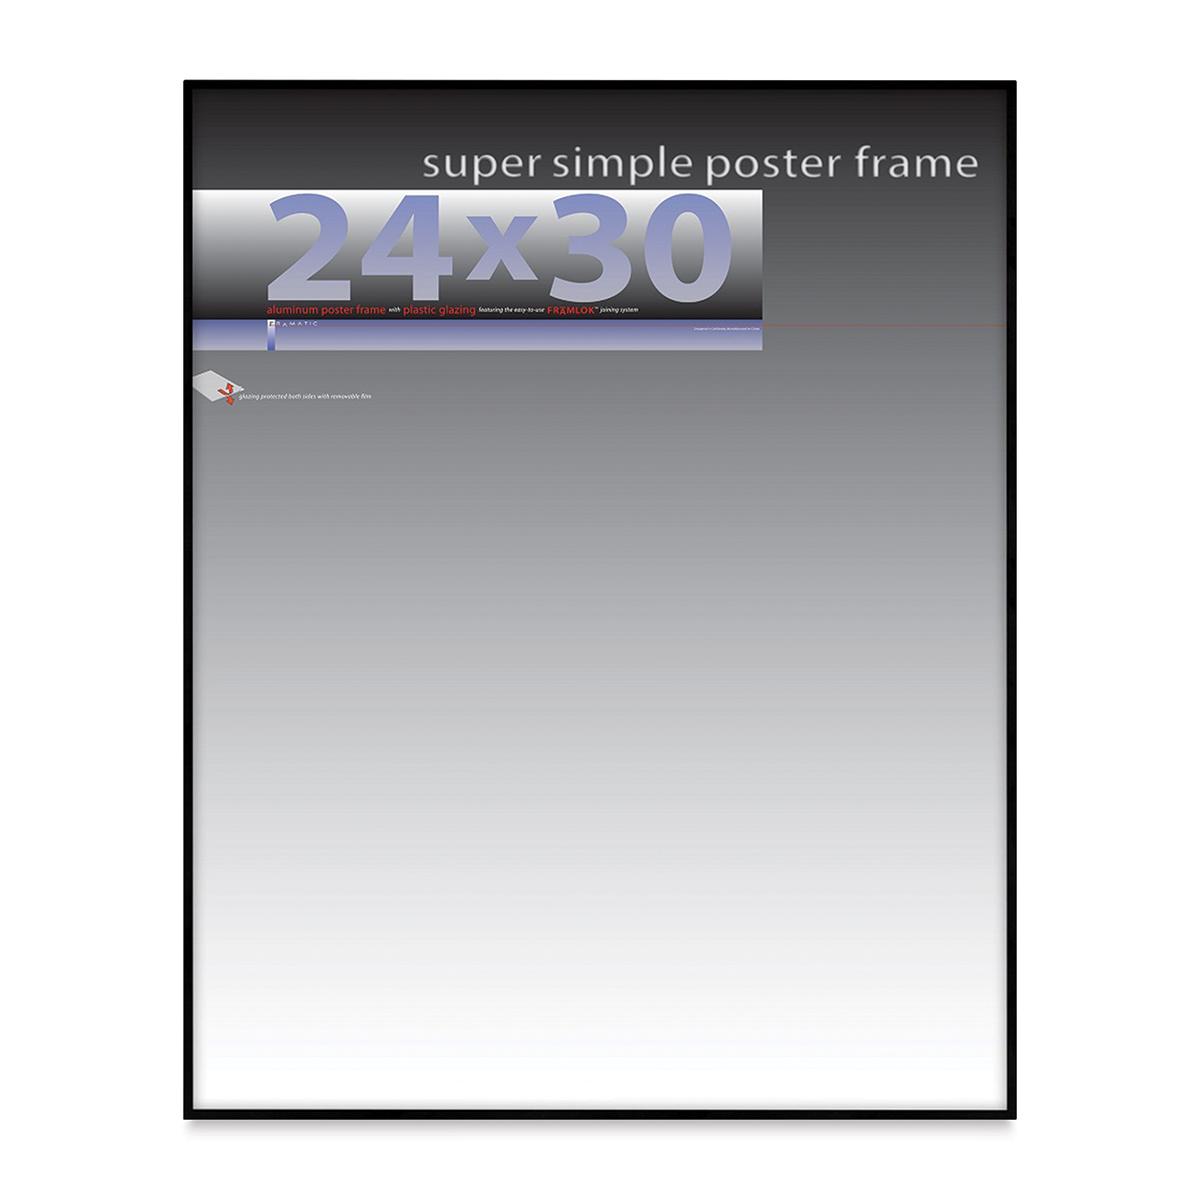 Framatic Super Simple Poster Frame - Black, 24 x 30